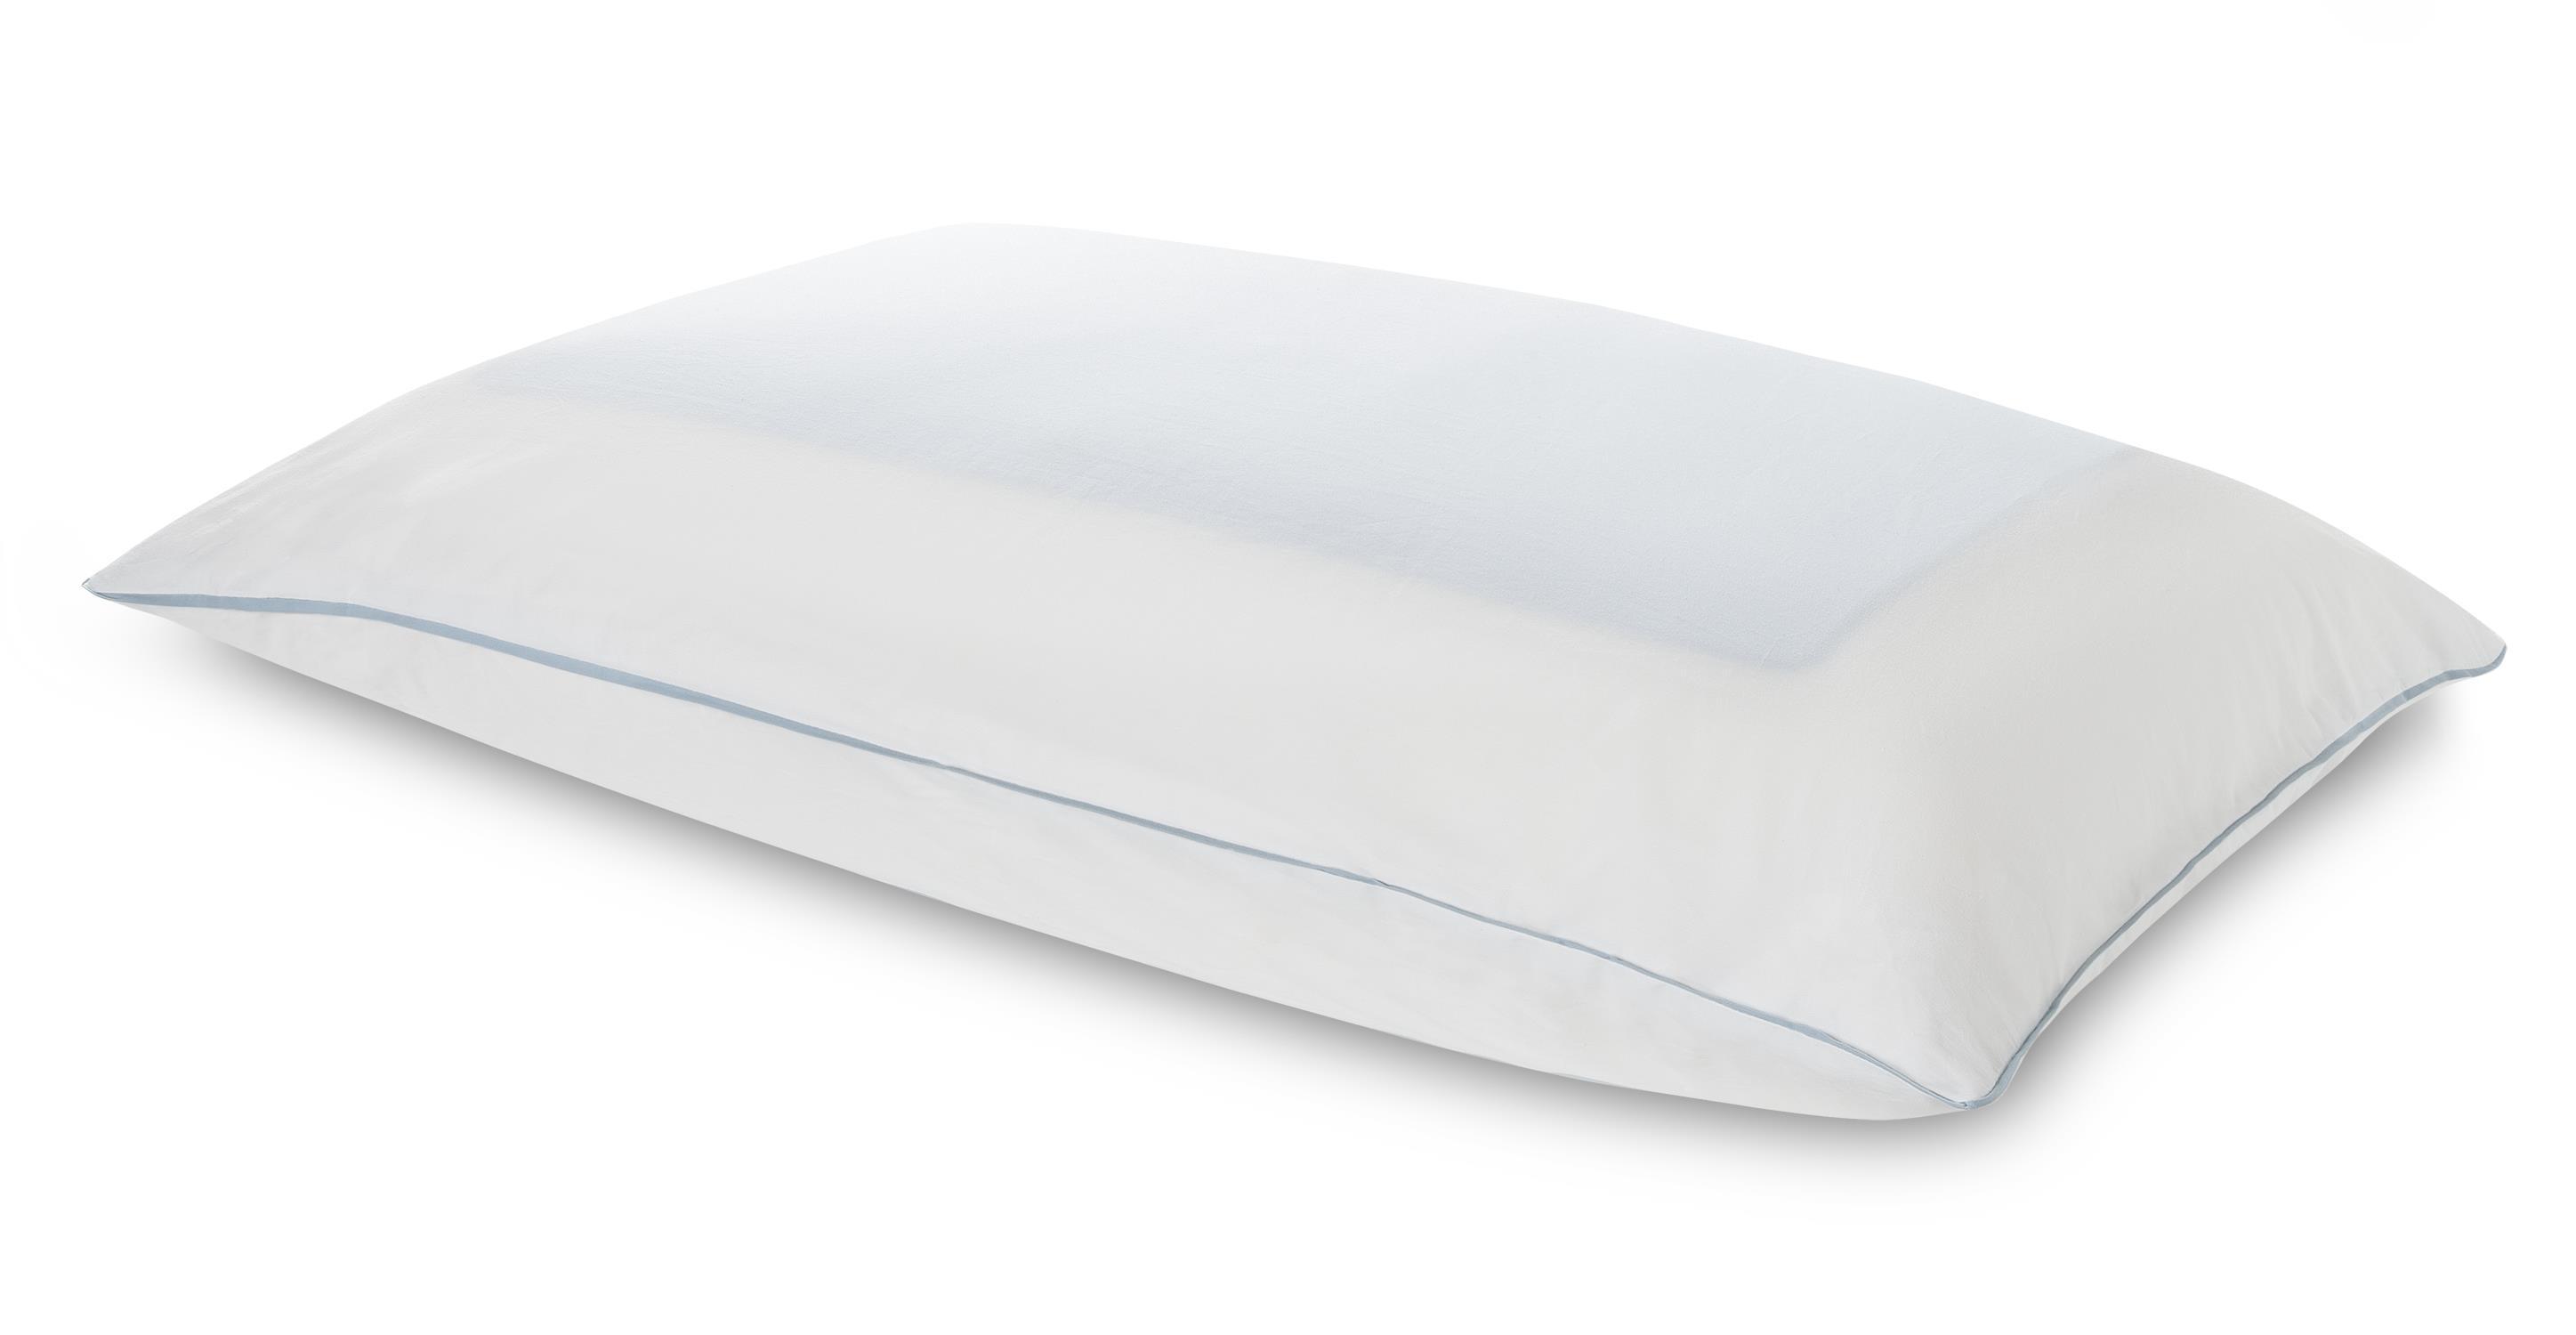 Tempur Pillows Queen Tempur-Cloud Breeze Dual Cool Pillow by Tempur-Pedic® at Jacksonville Furniture Mart